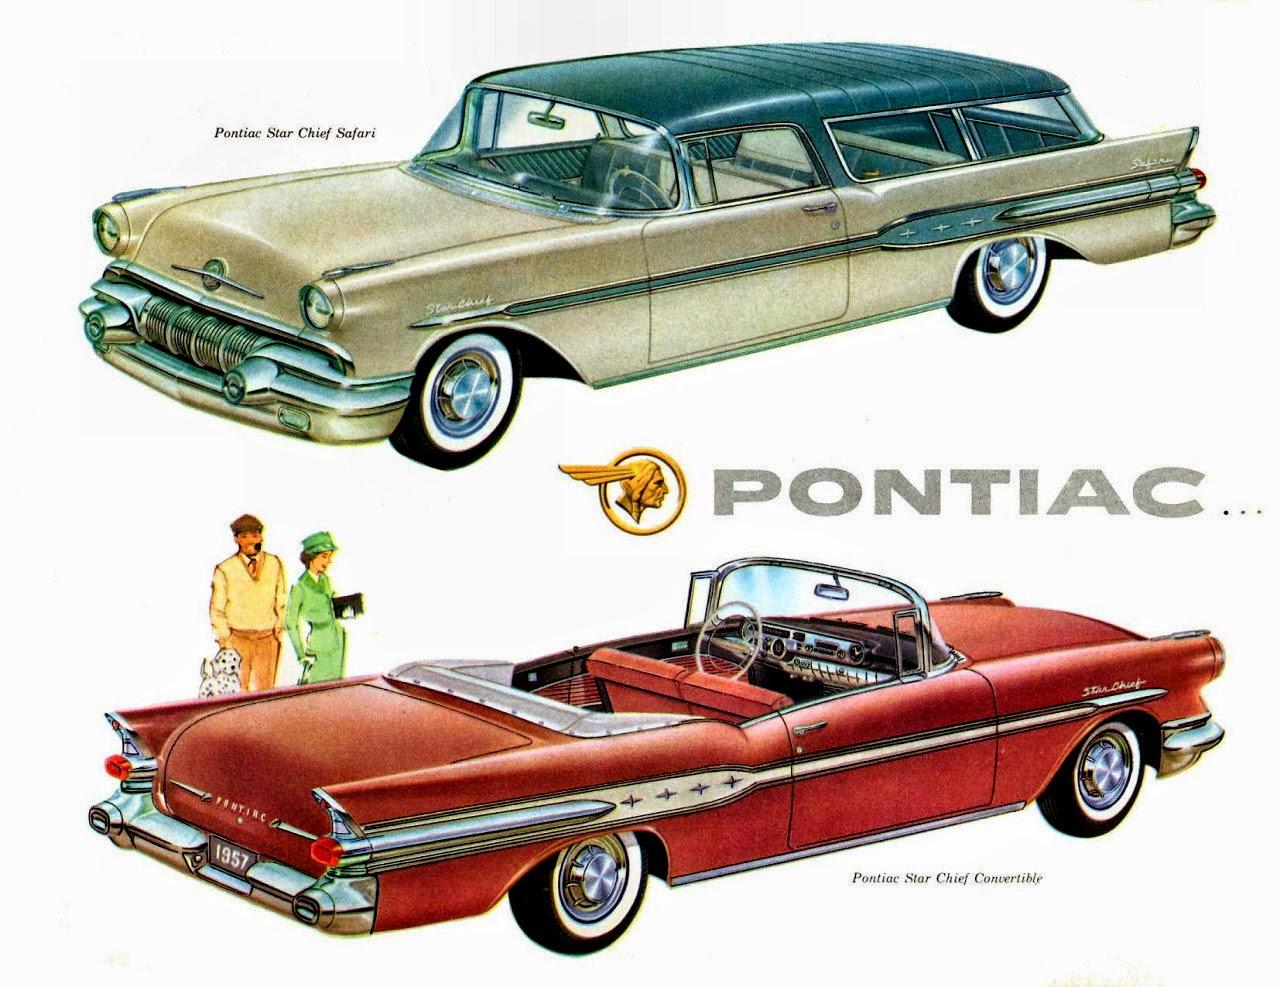 1957 Pontiac Star Chief Vintage Cars Ads 1960